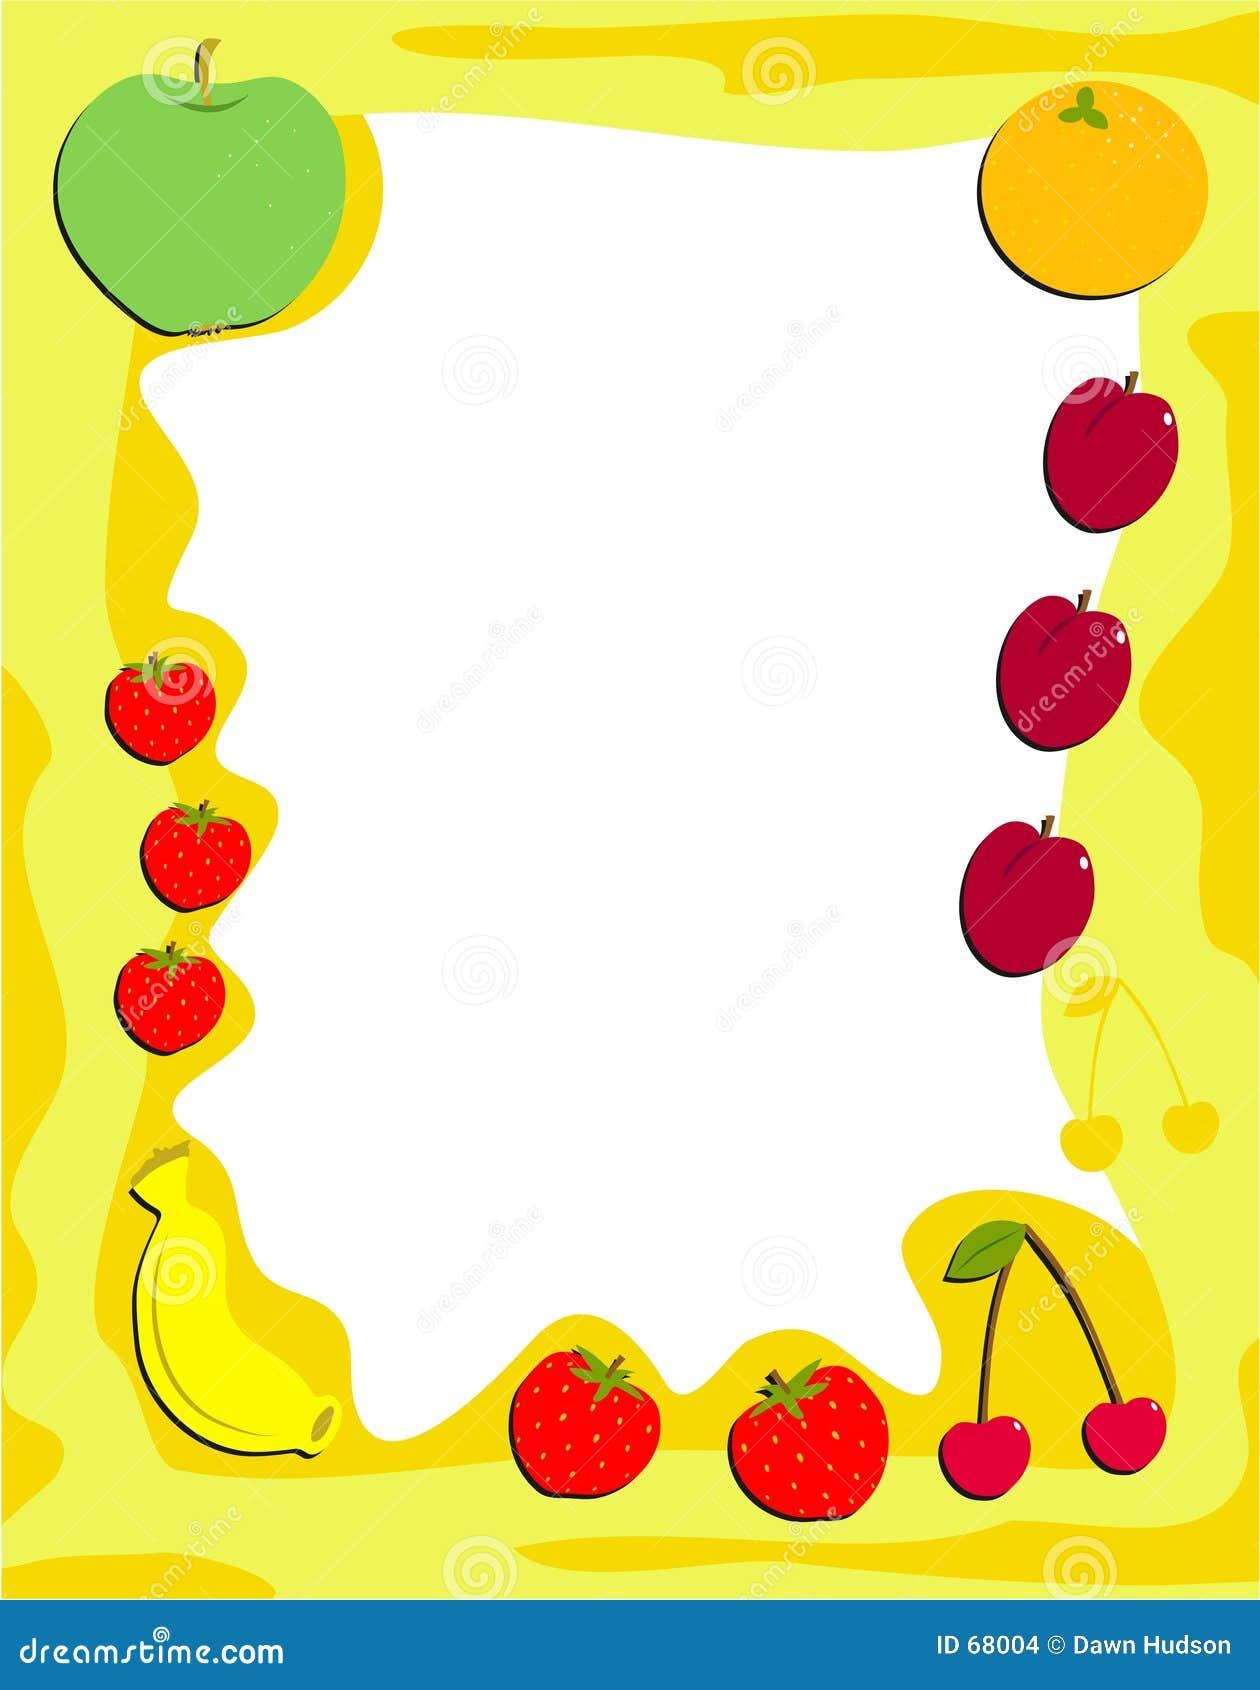 Fruit Frame Stock Images - Image: 68004